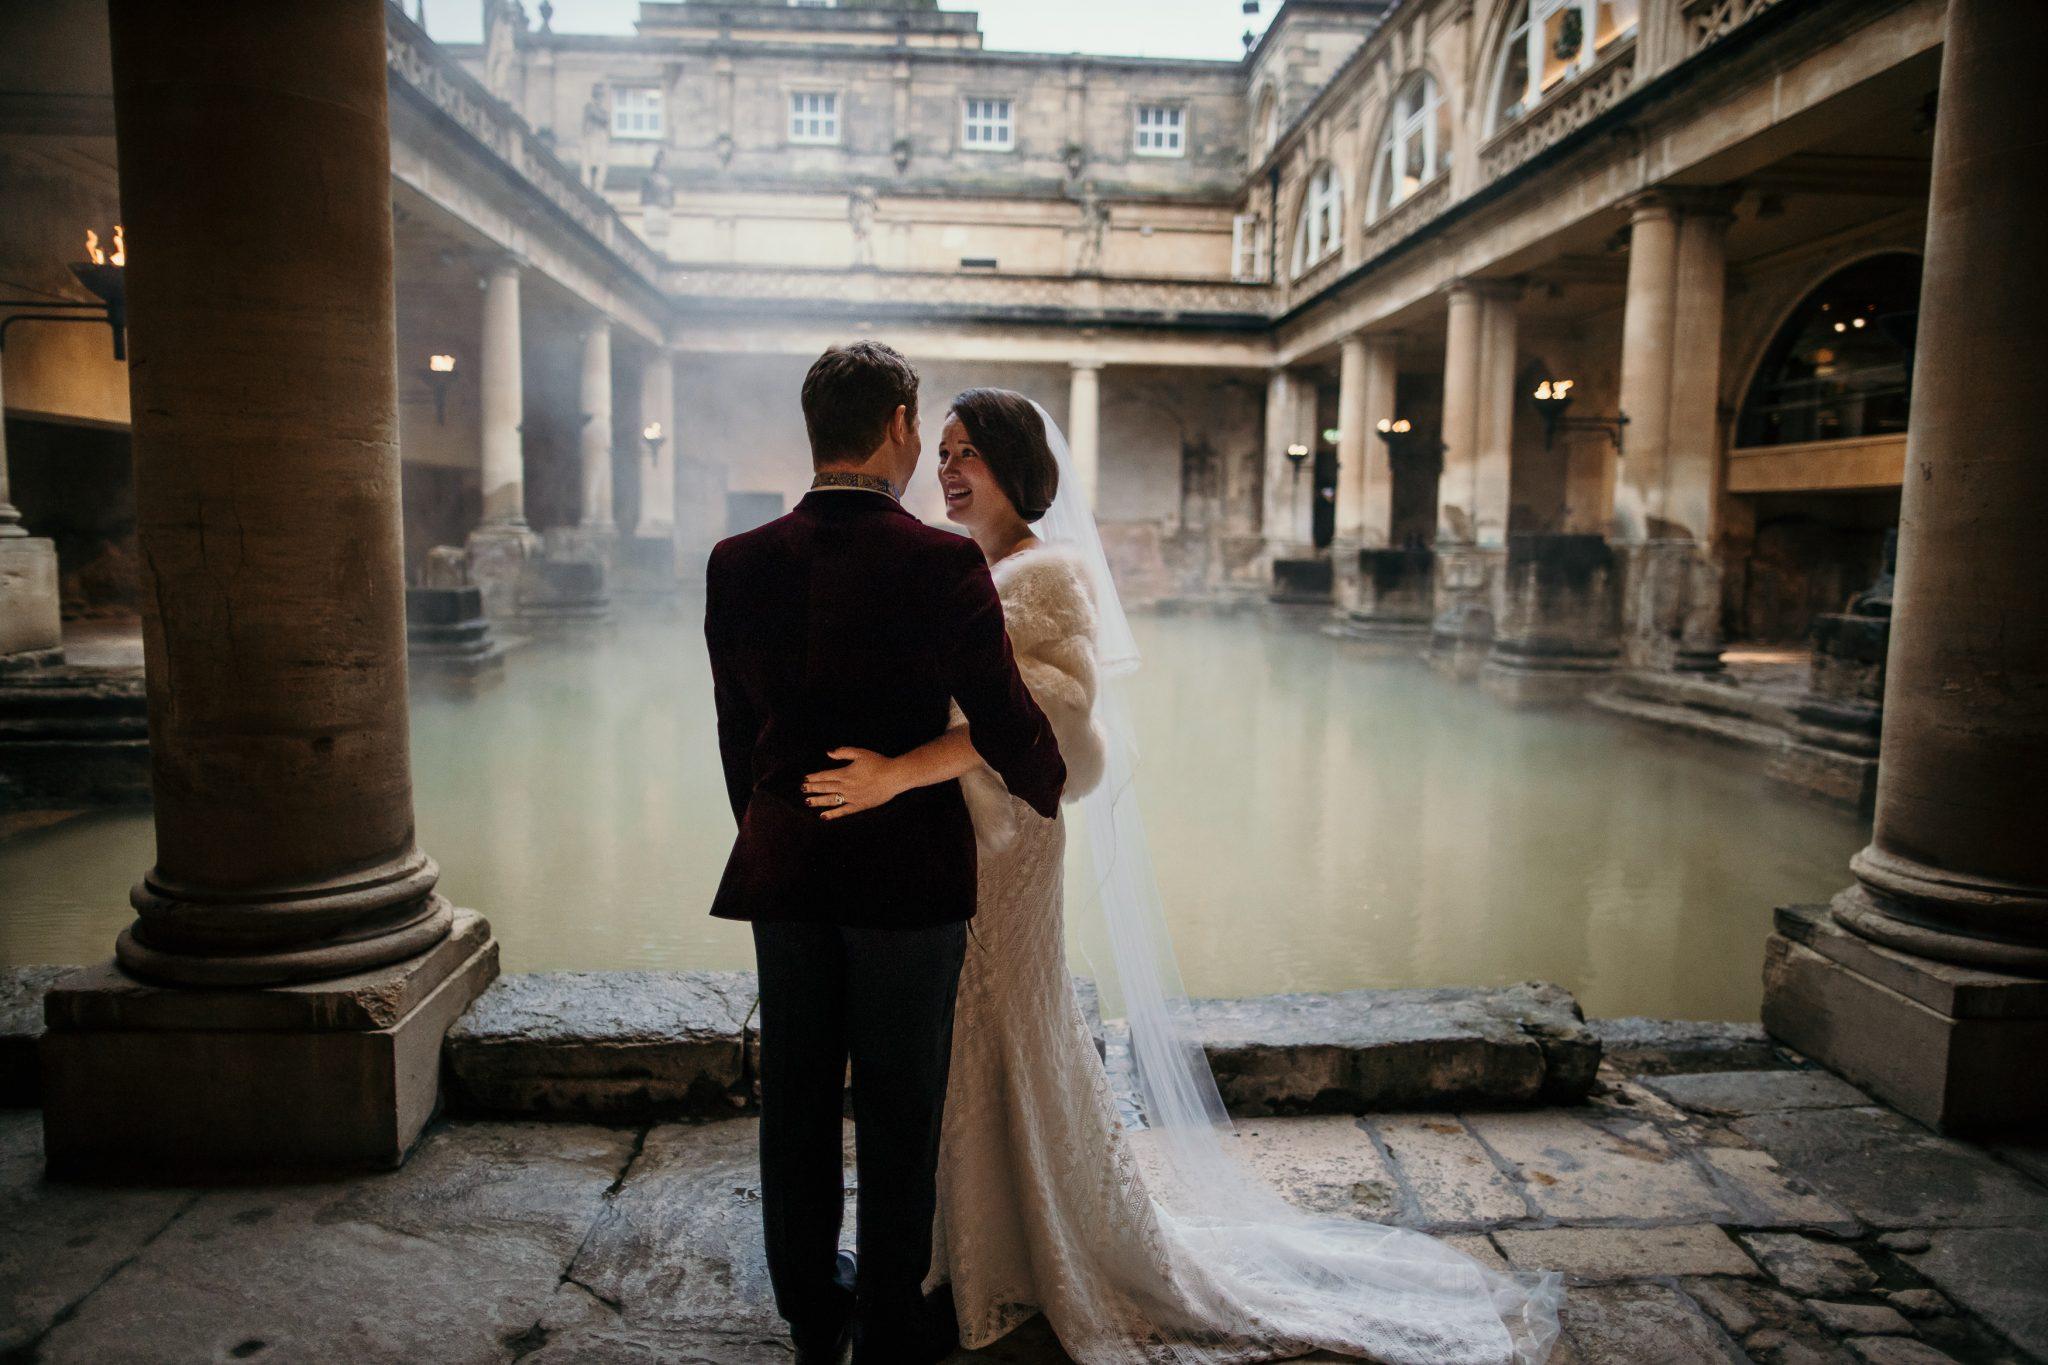 Roman bath wedding